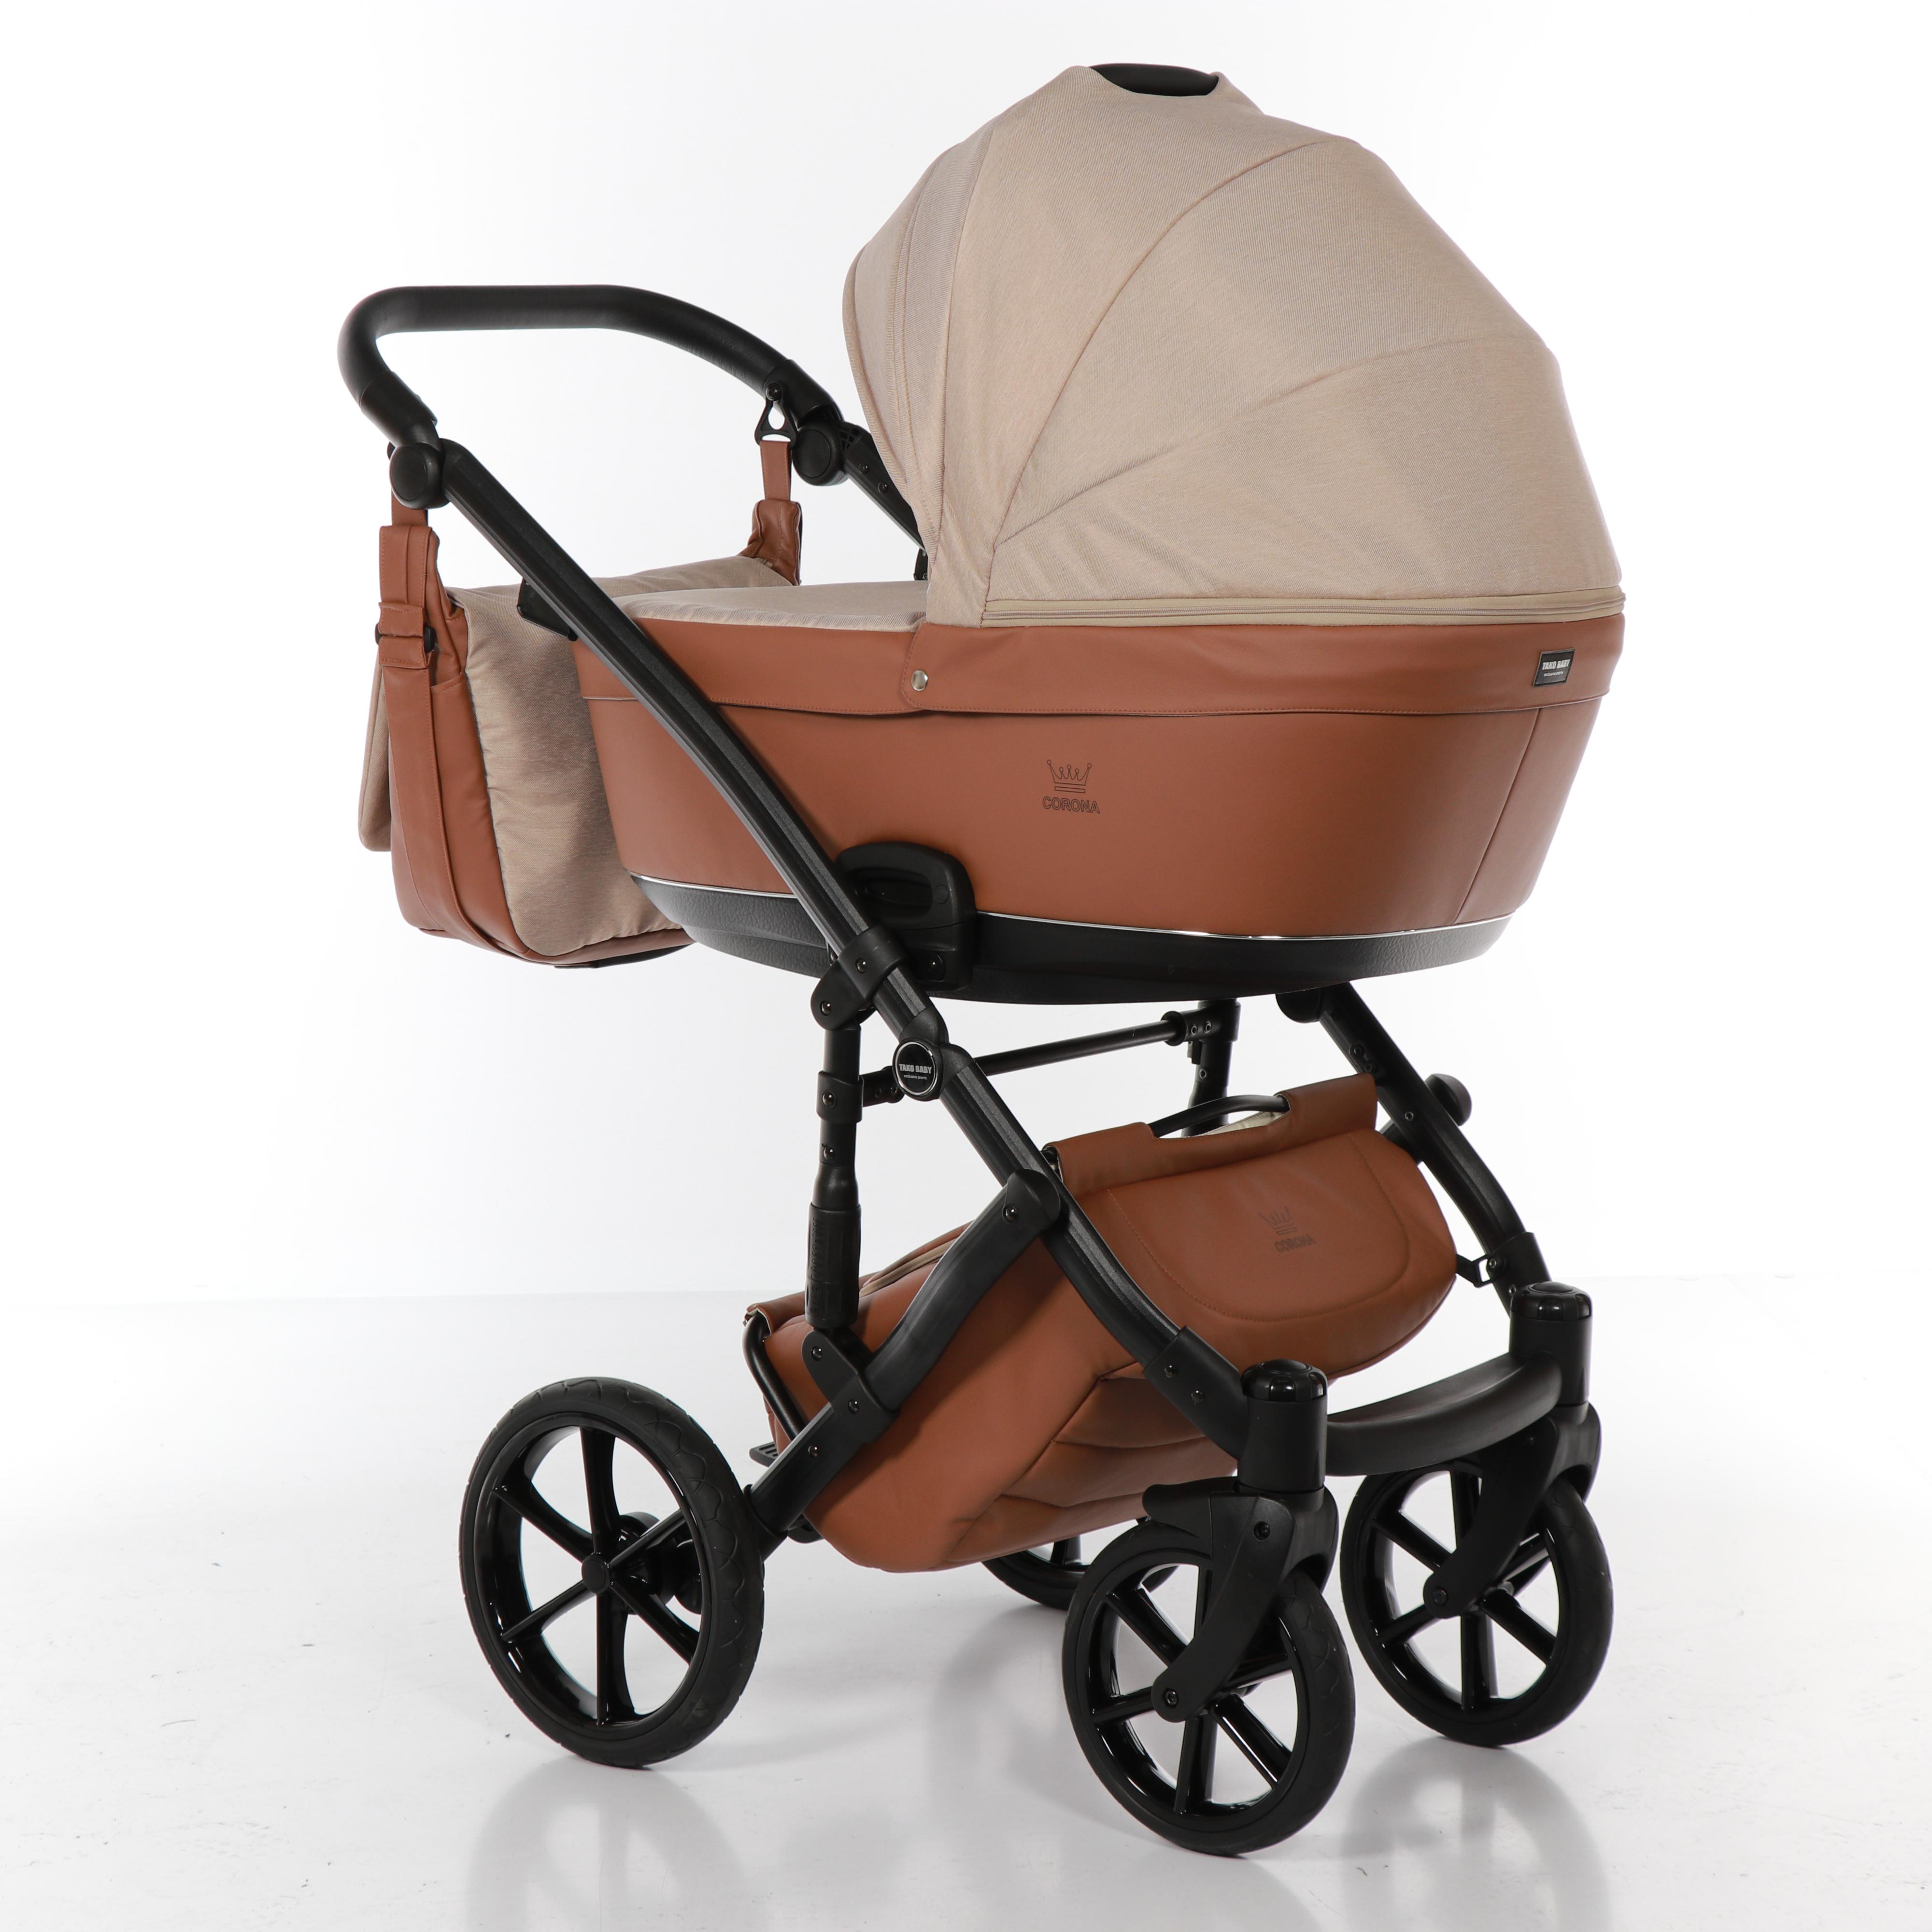 Tako baby - Corona Lite - bicolore - Marrone /Beige - NEWS !!!